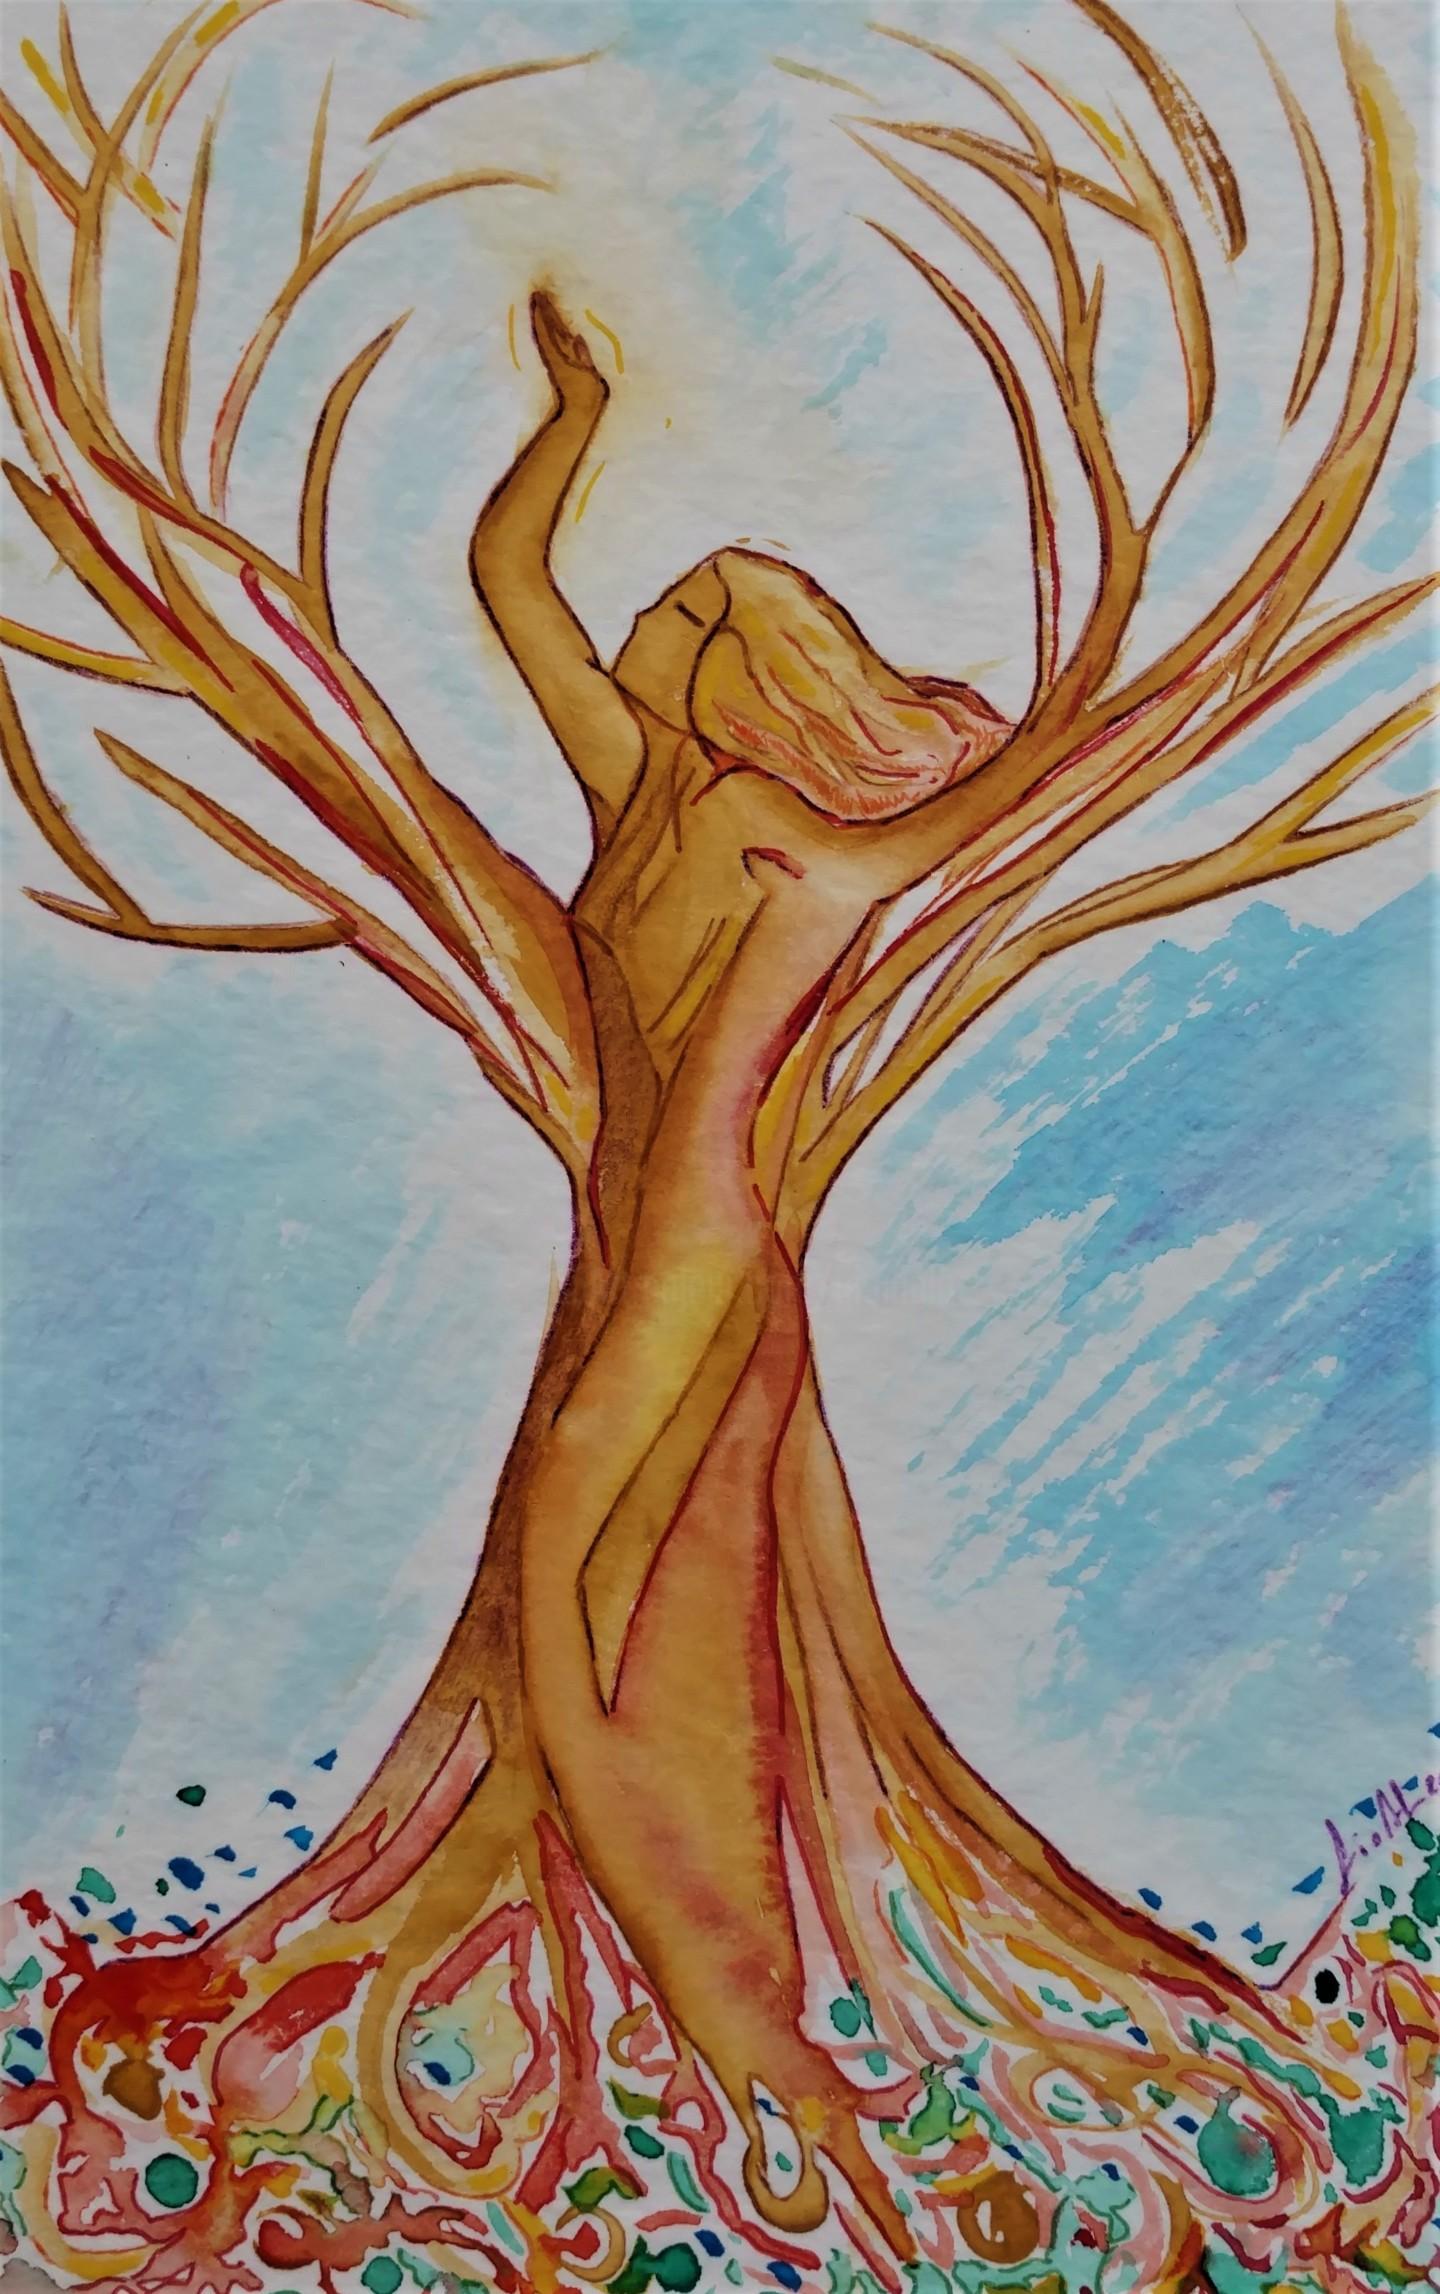 Gioia Albano - Femme arbre (Woman Tree)